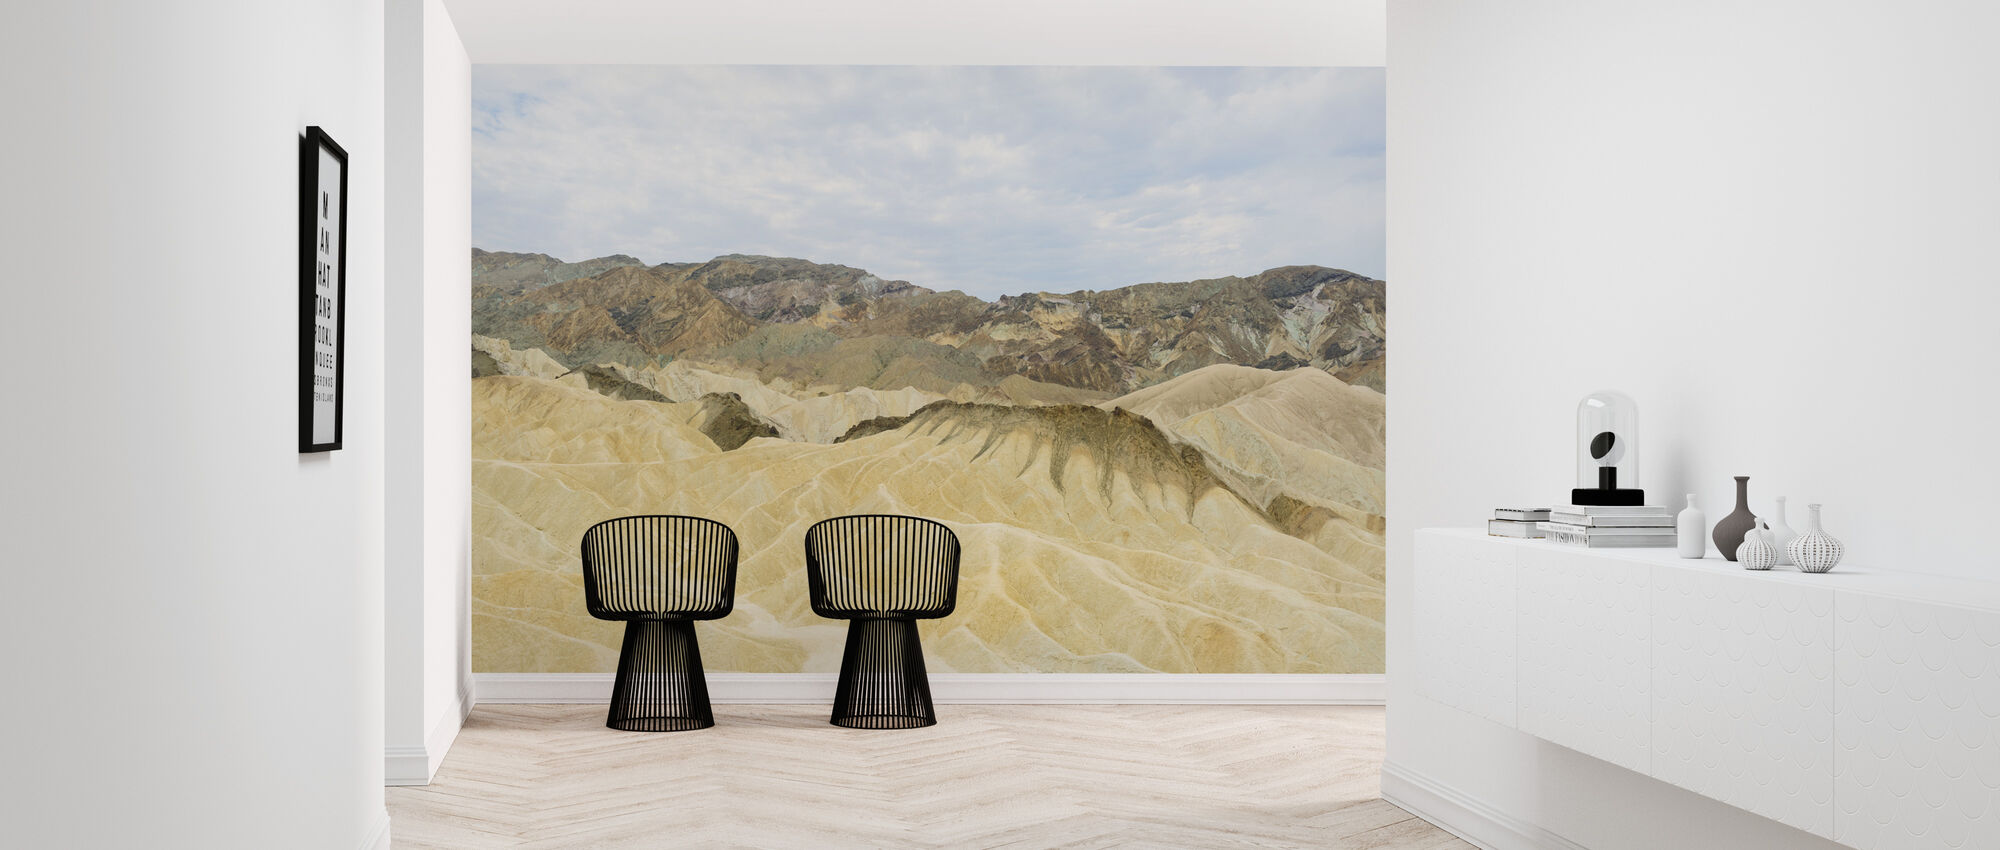 Death Valley National Park, California - Wallpaper - Hallway